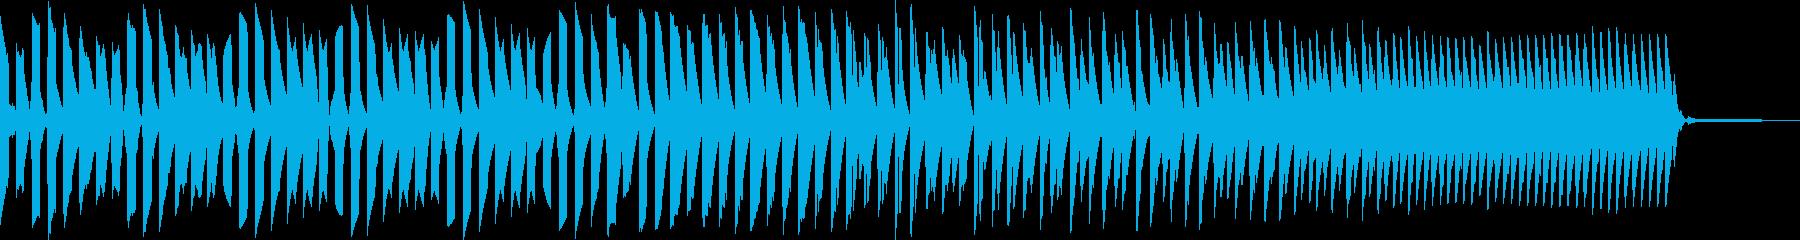 AMGアナログFX 4の再生済みの波形